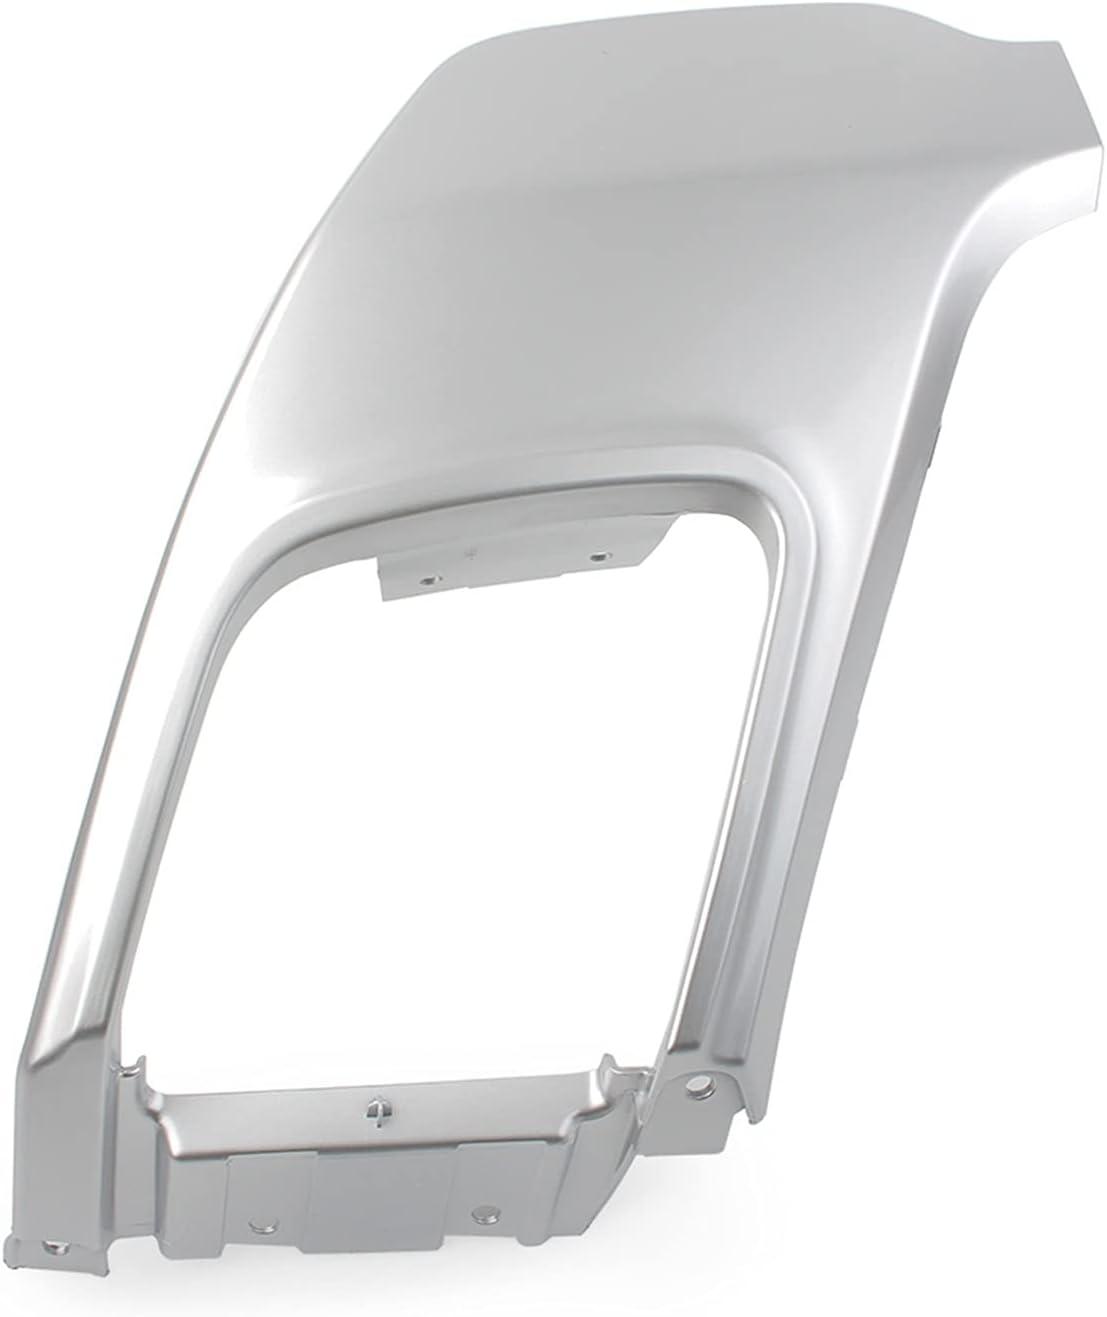 Hongyan SHIHONGYAN Car Rear Bumper Left LR028089 Max 55% Max 84% OFF OFF Cover Eye Tow F